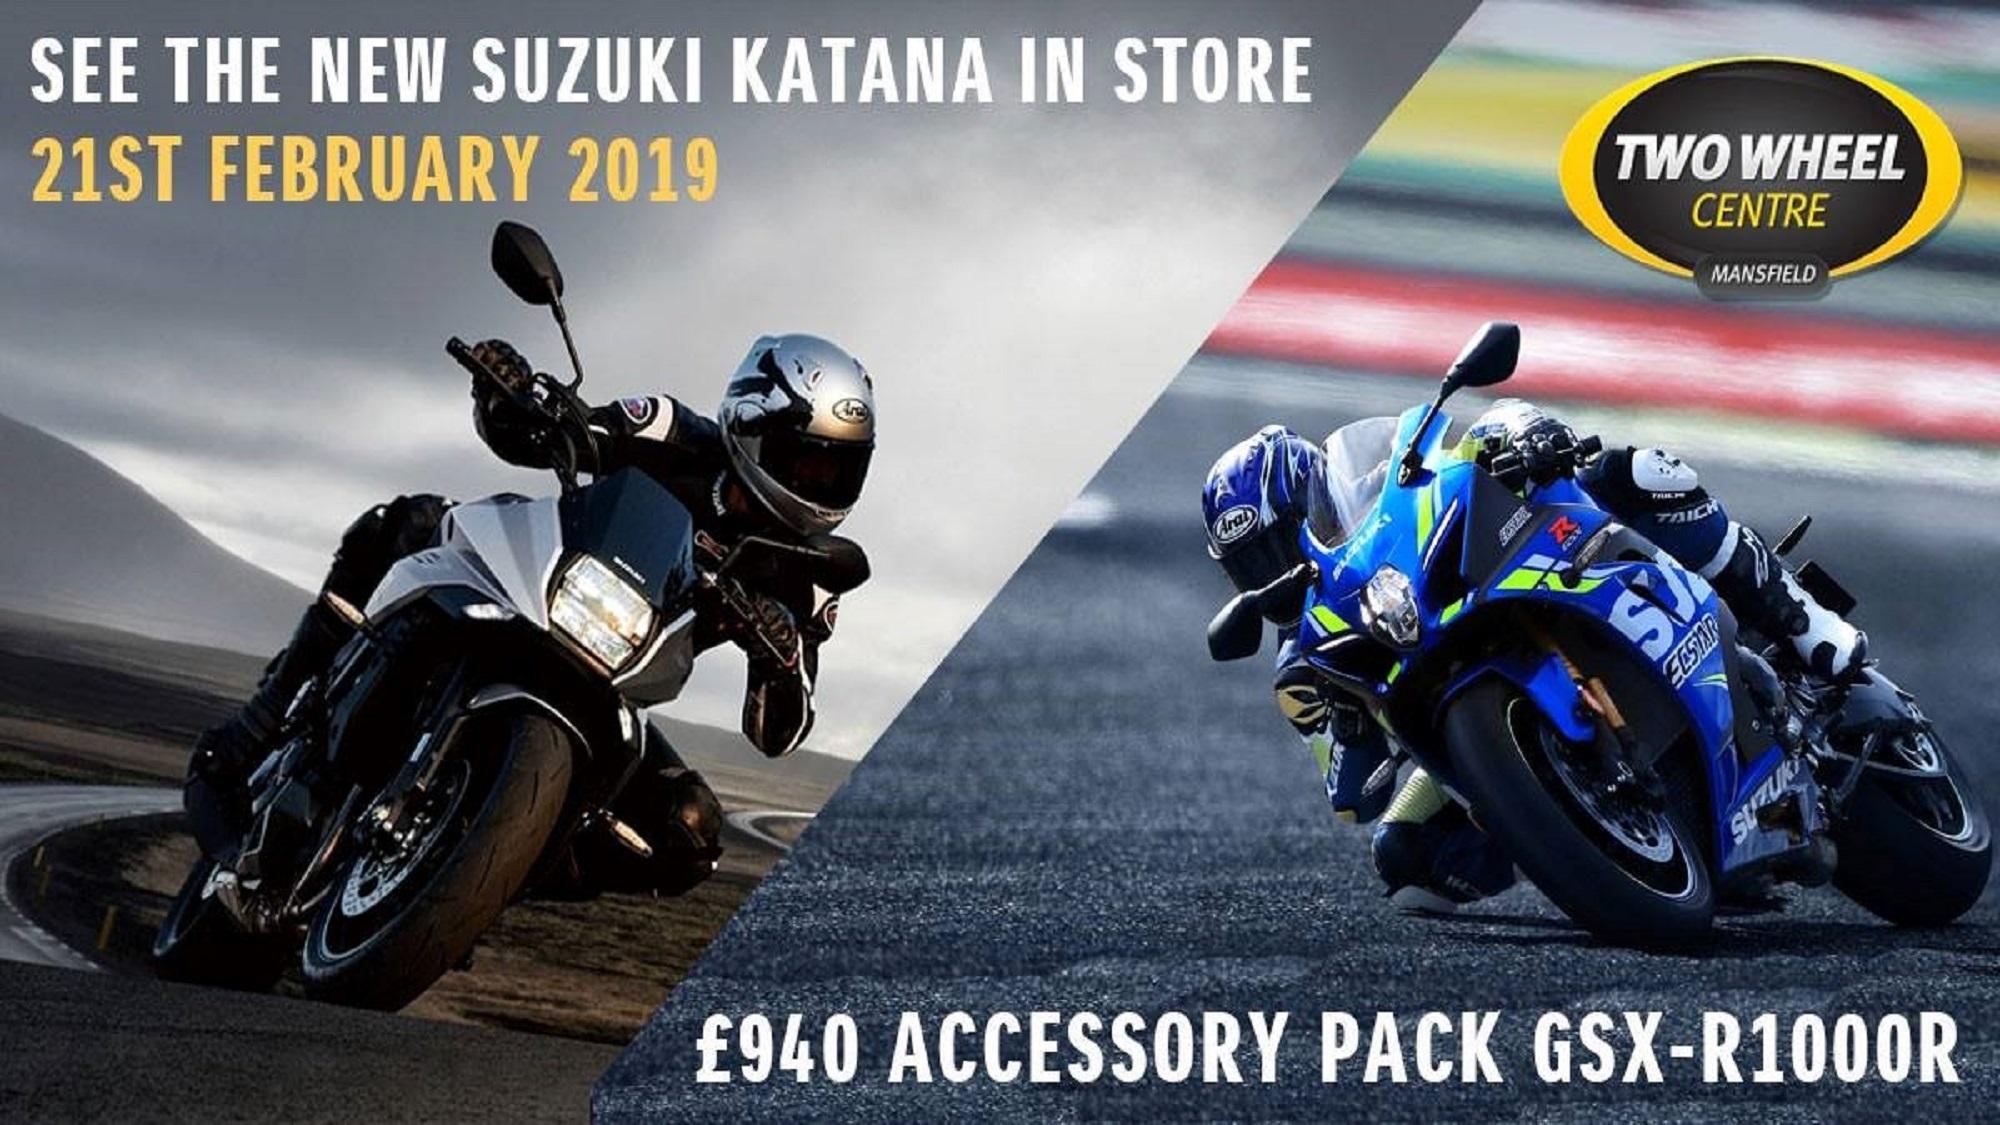 See the new Suzuki Katana in store on 21st February 2019